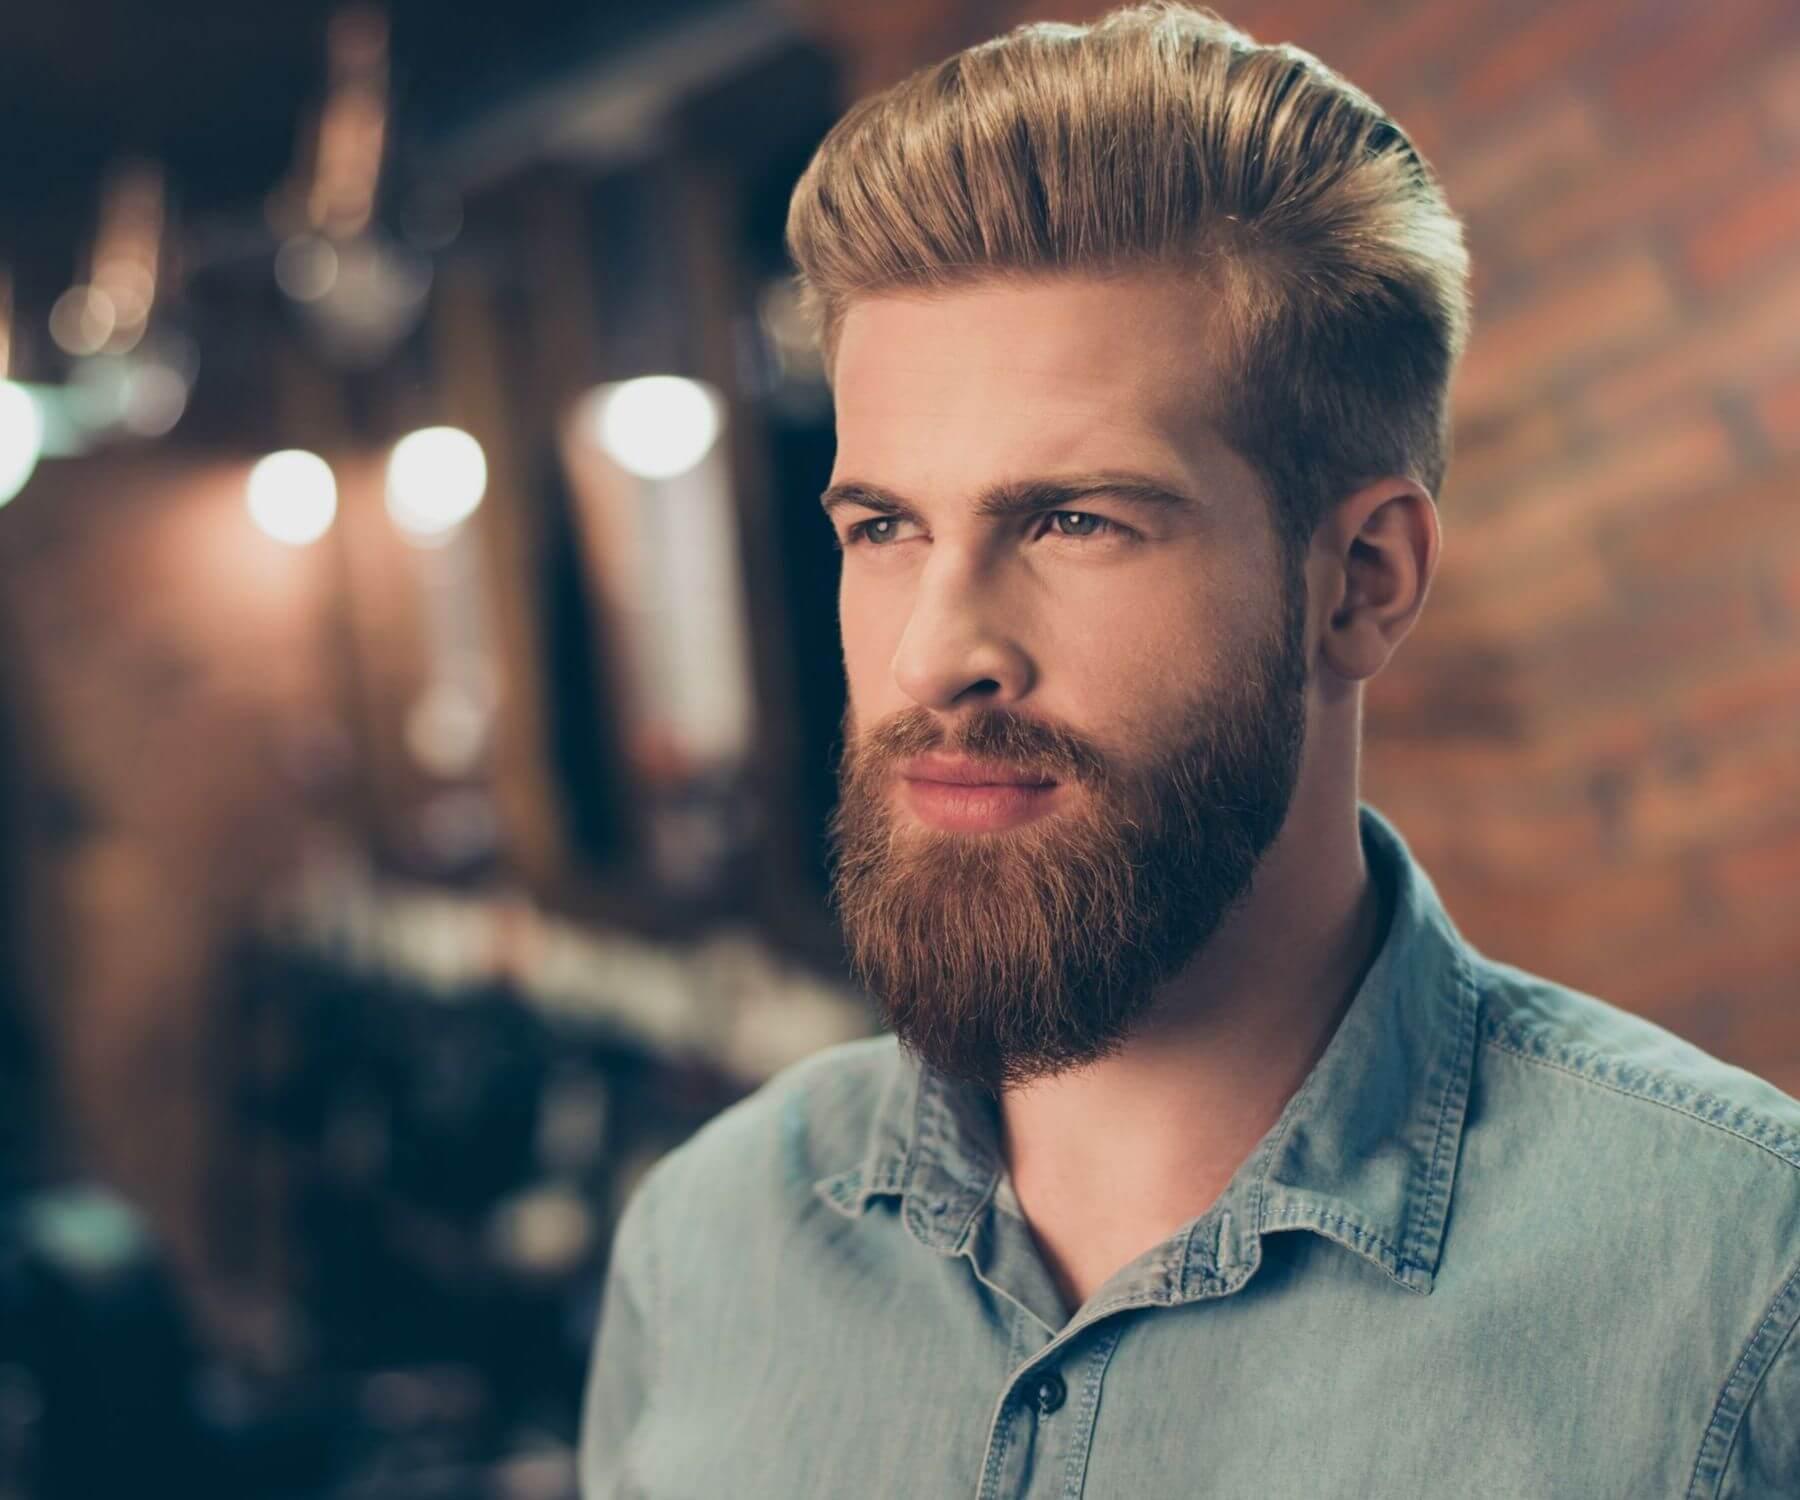 Shaving myths busted